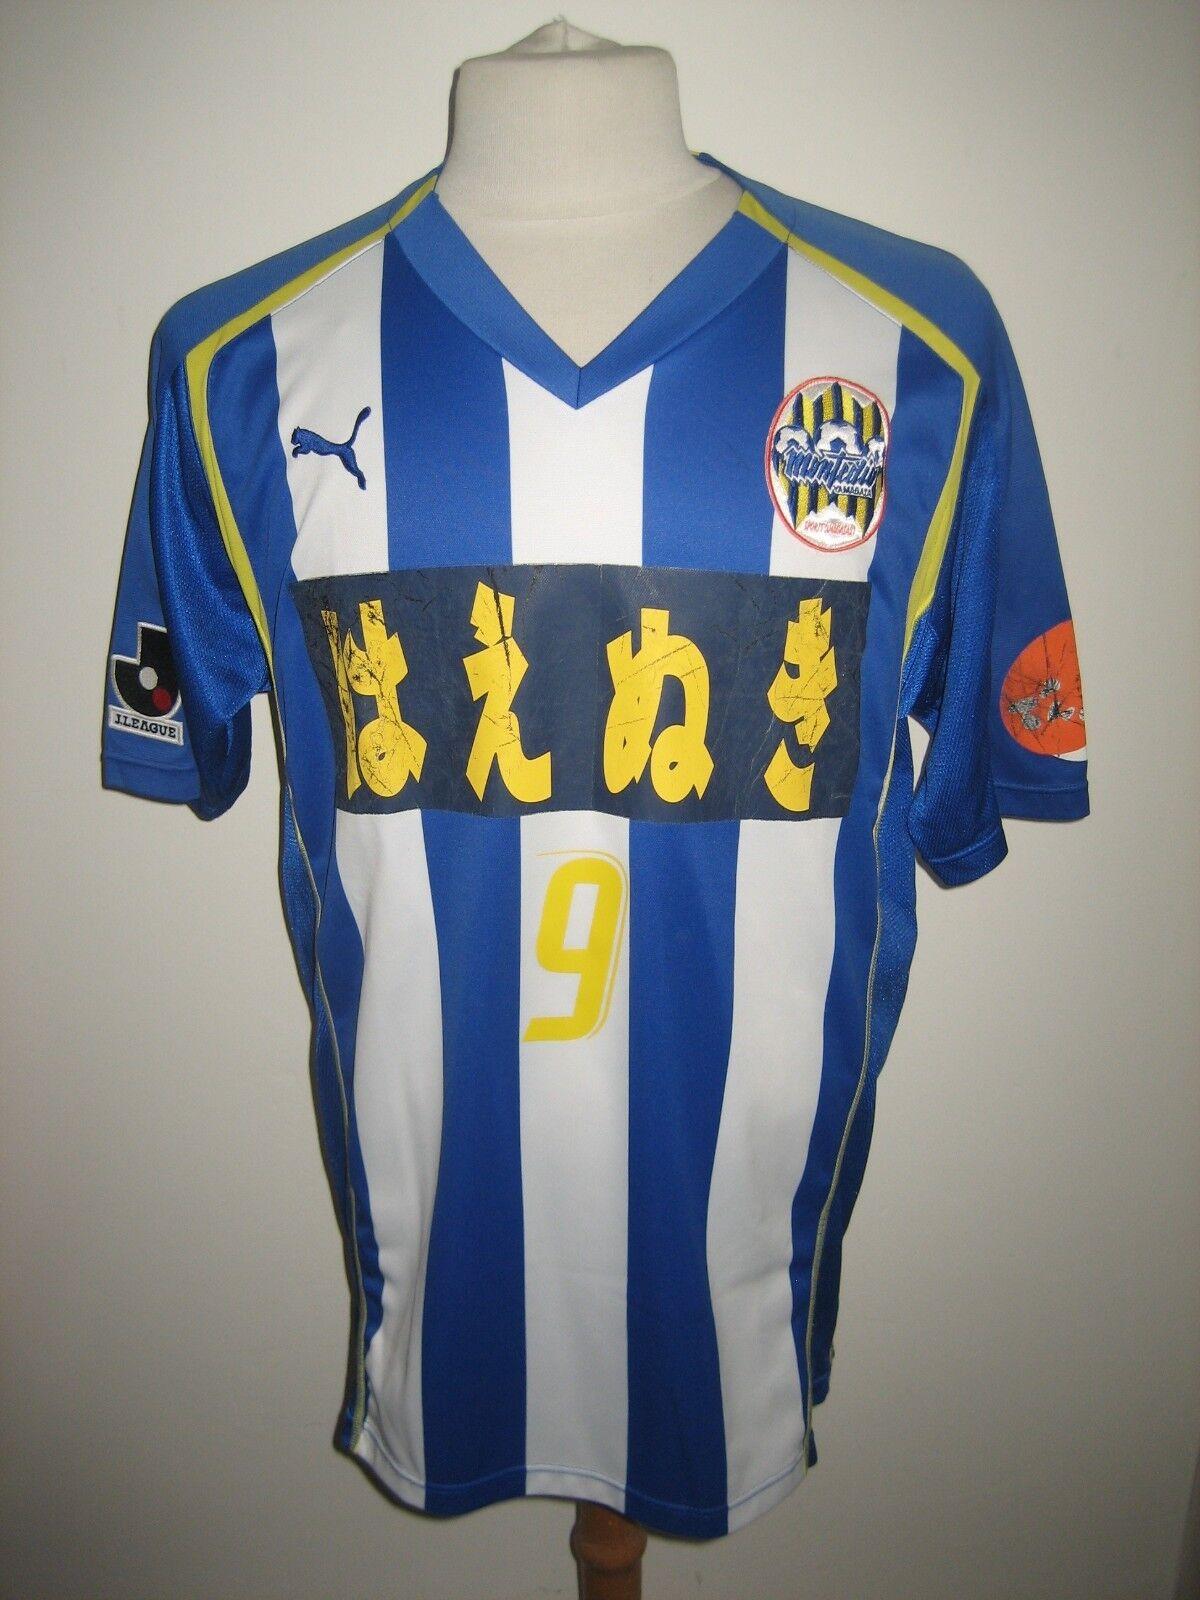 Montedio Yamagata MATCH WORN Japan footbtutti shirt soccer jersey maillot Diuominiione XL